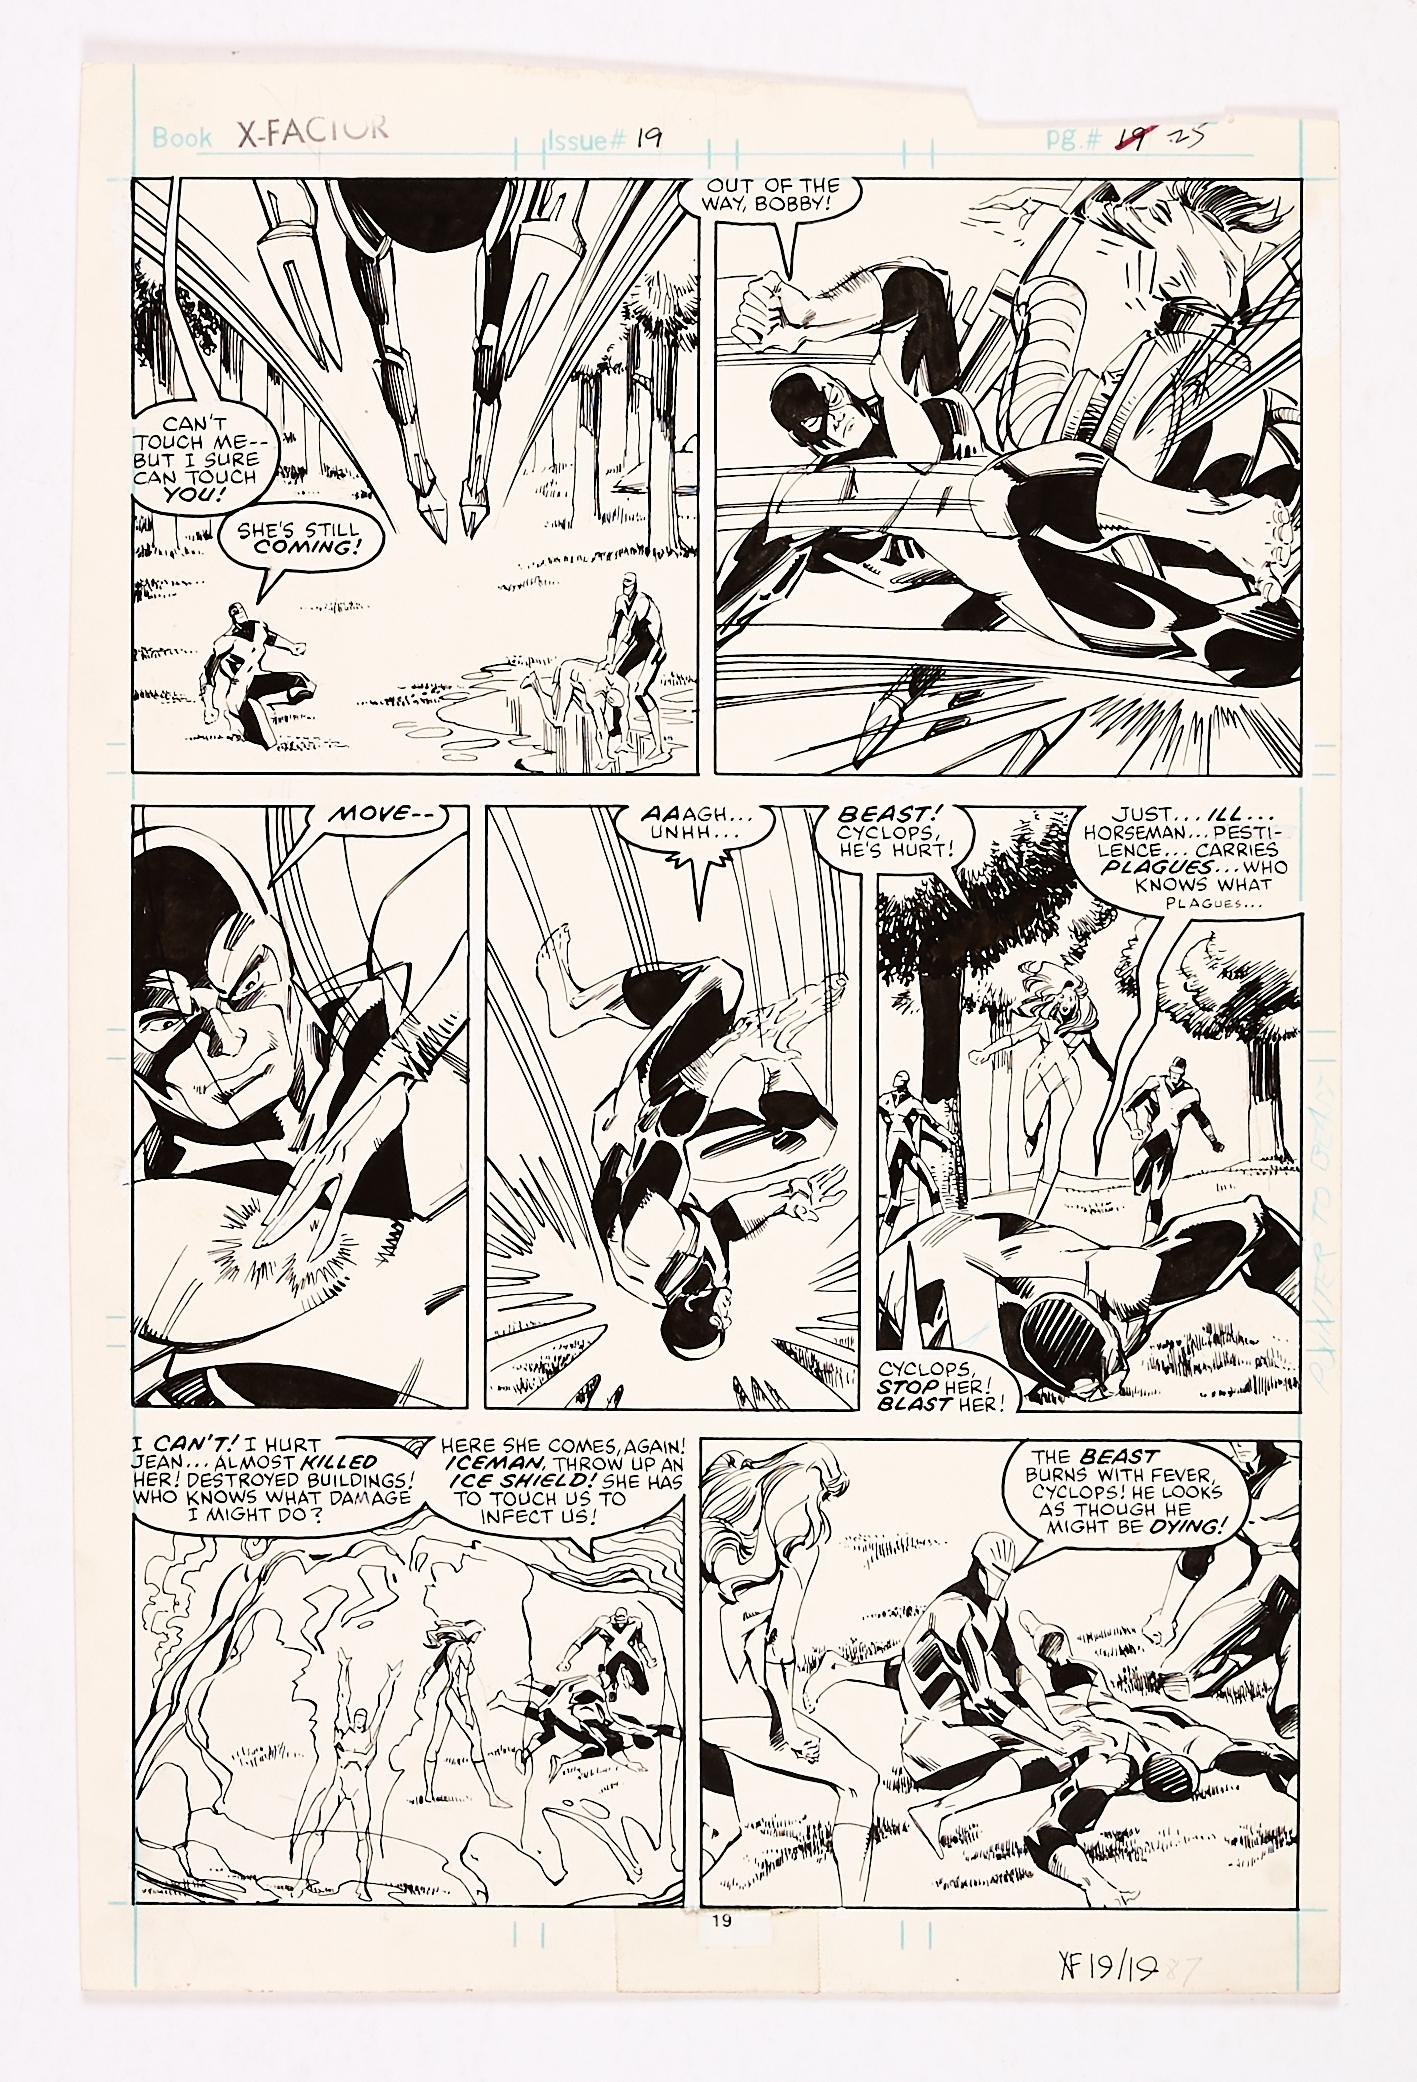 Lot 253 - X-Factor #19 (1987) pg 25 original artwork by Walt Simonson. In the fight against the Apocalypse